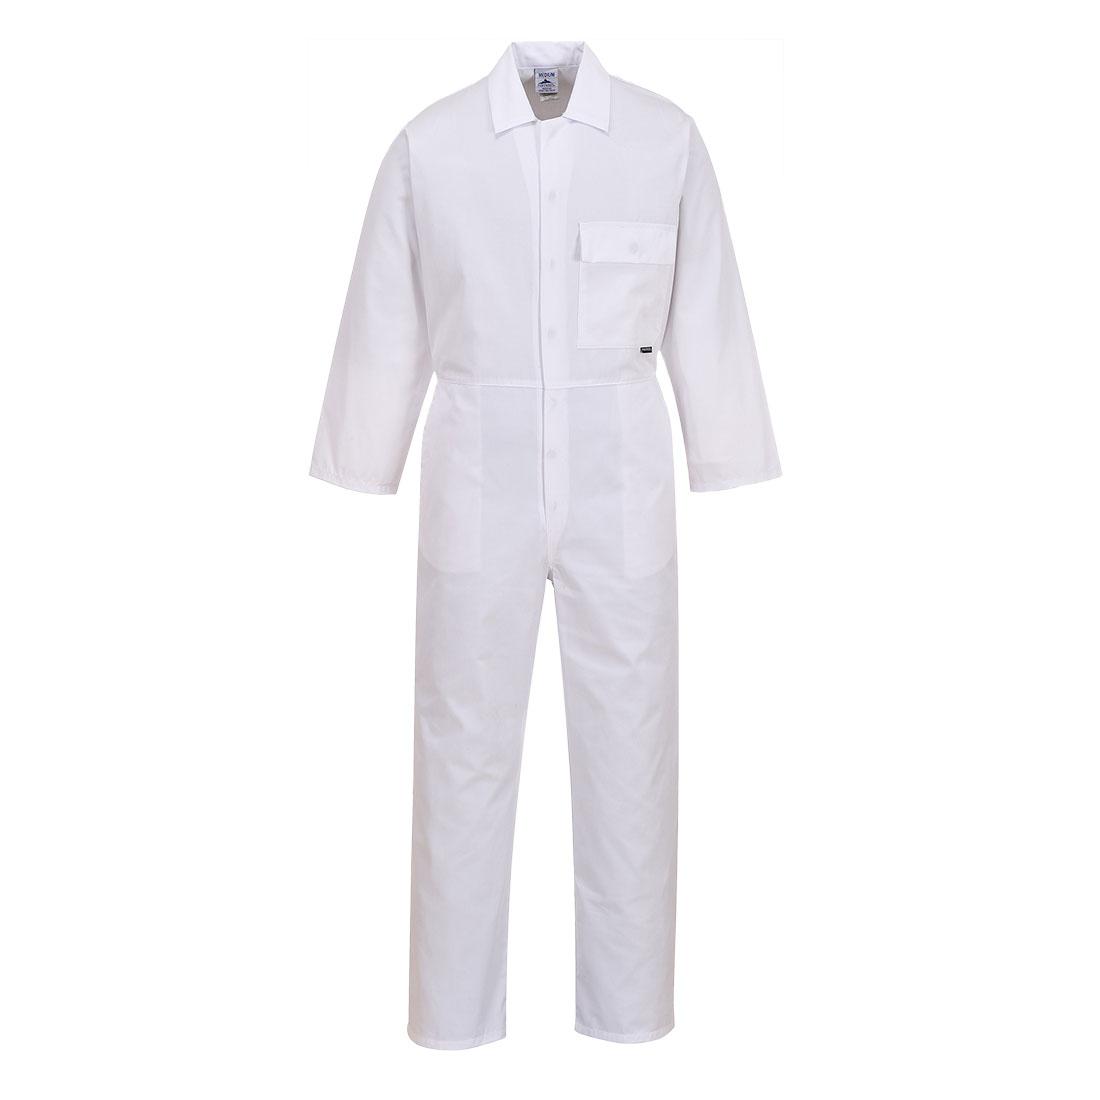 Standard Boilersuit White XSR